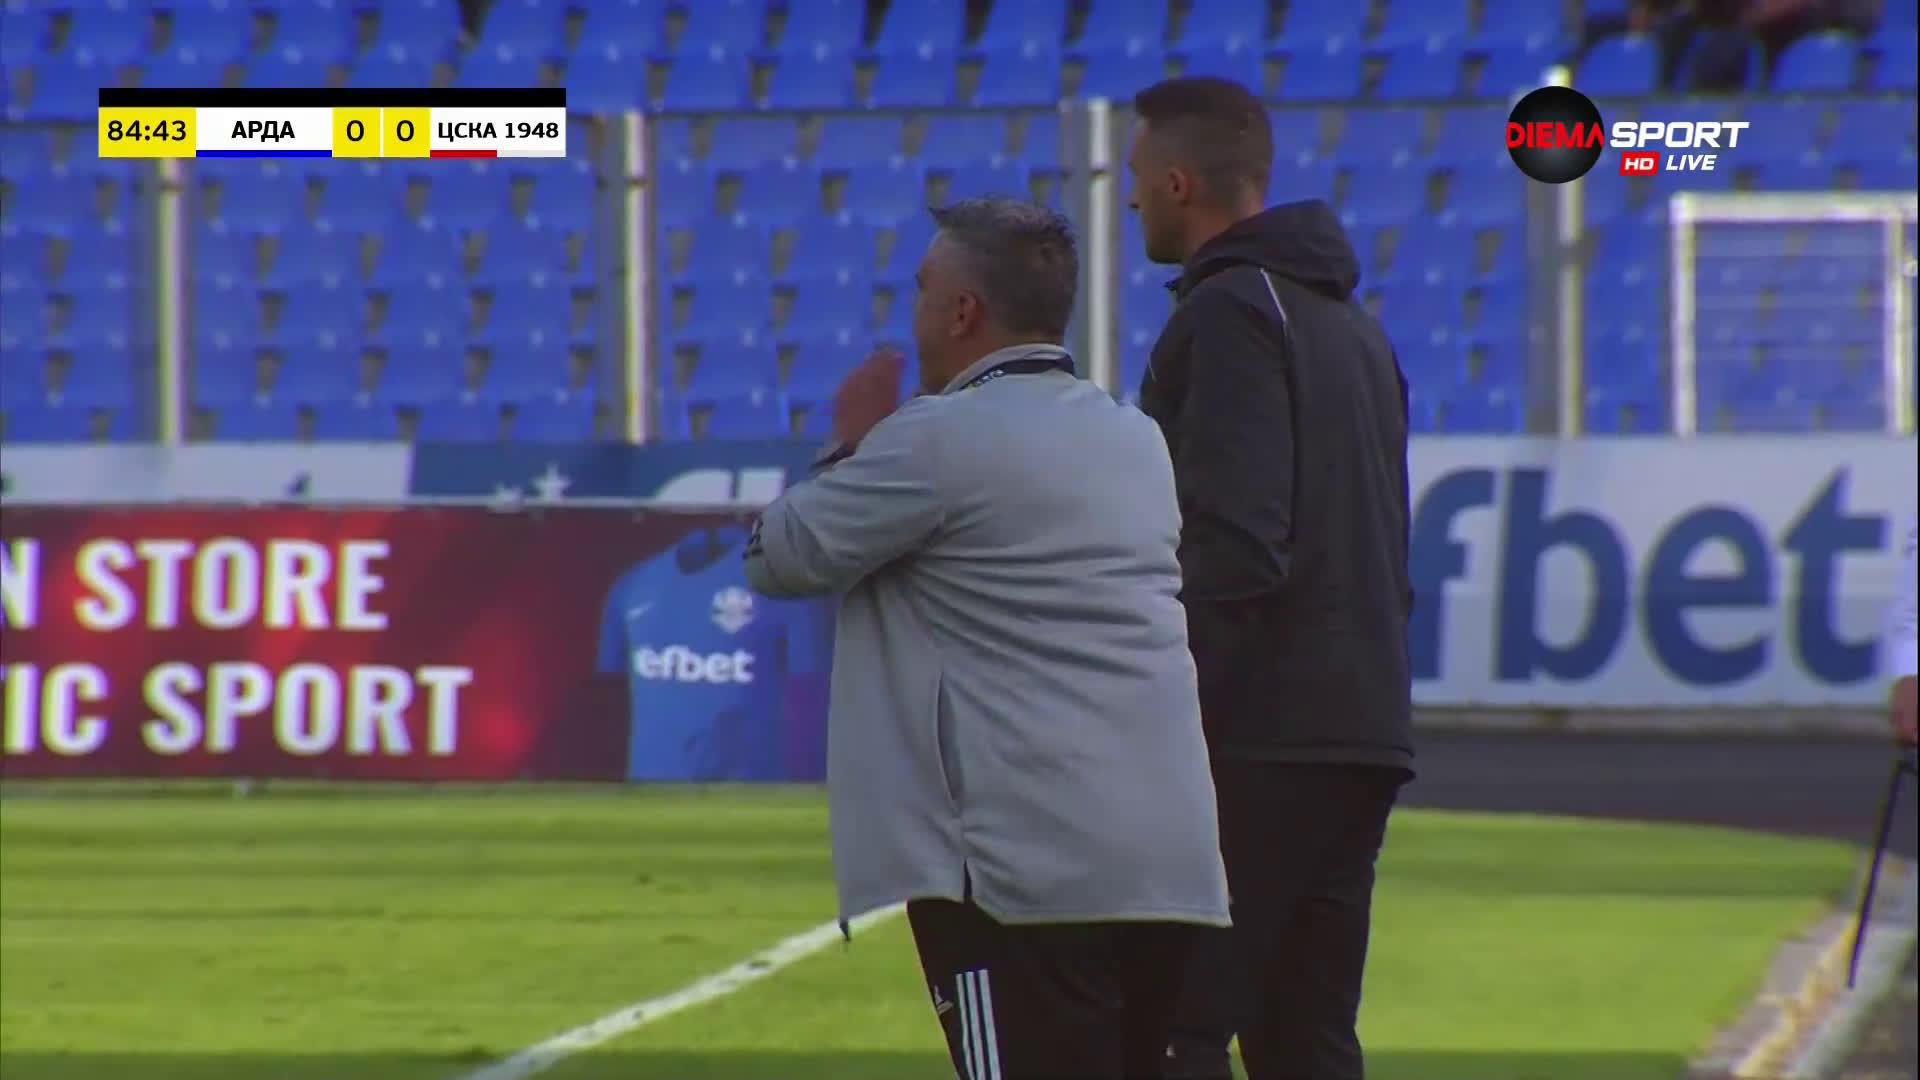 Александров остави ЦСКА 1948 с 10 души на терена срещу Арда